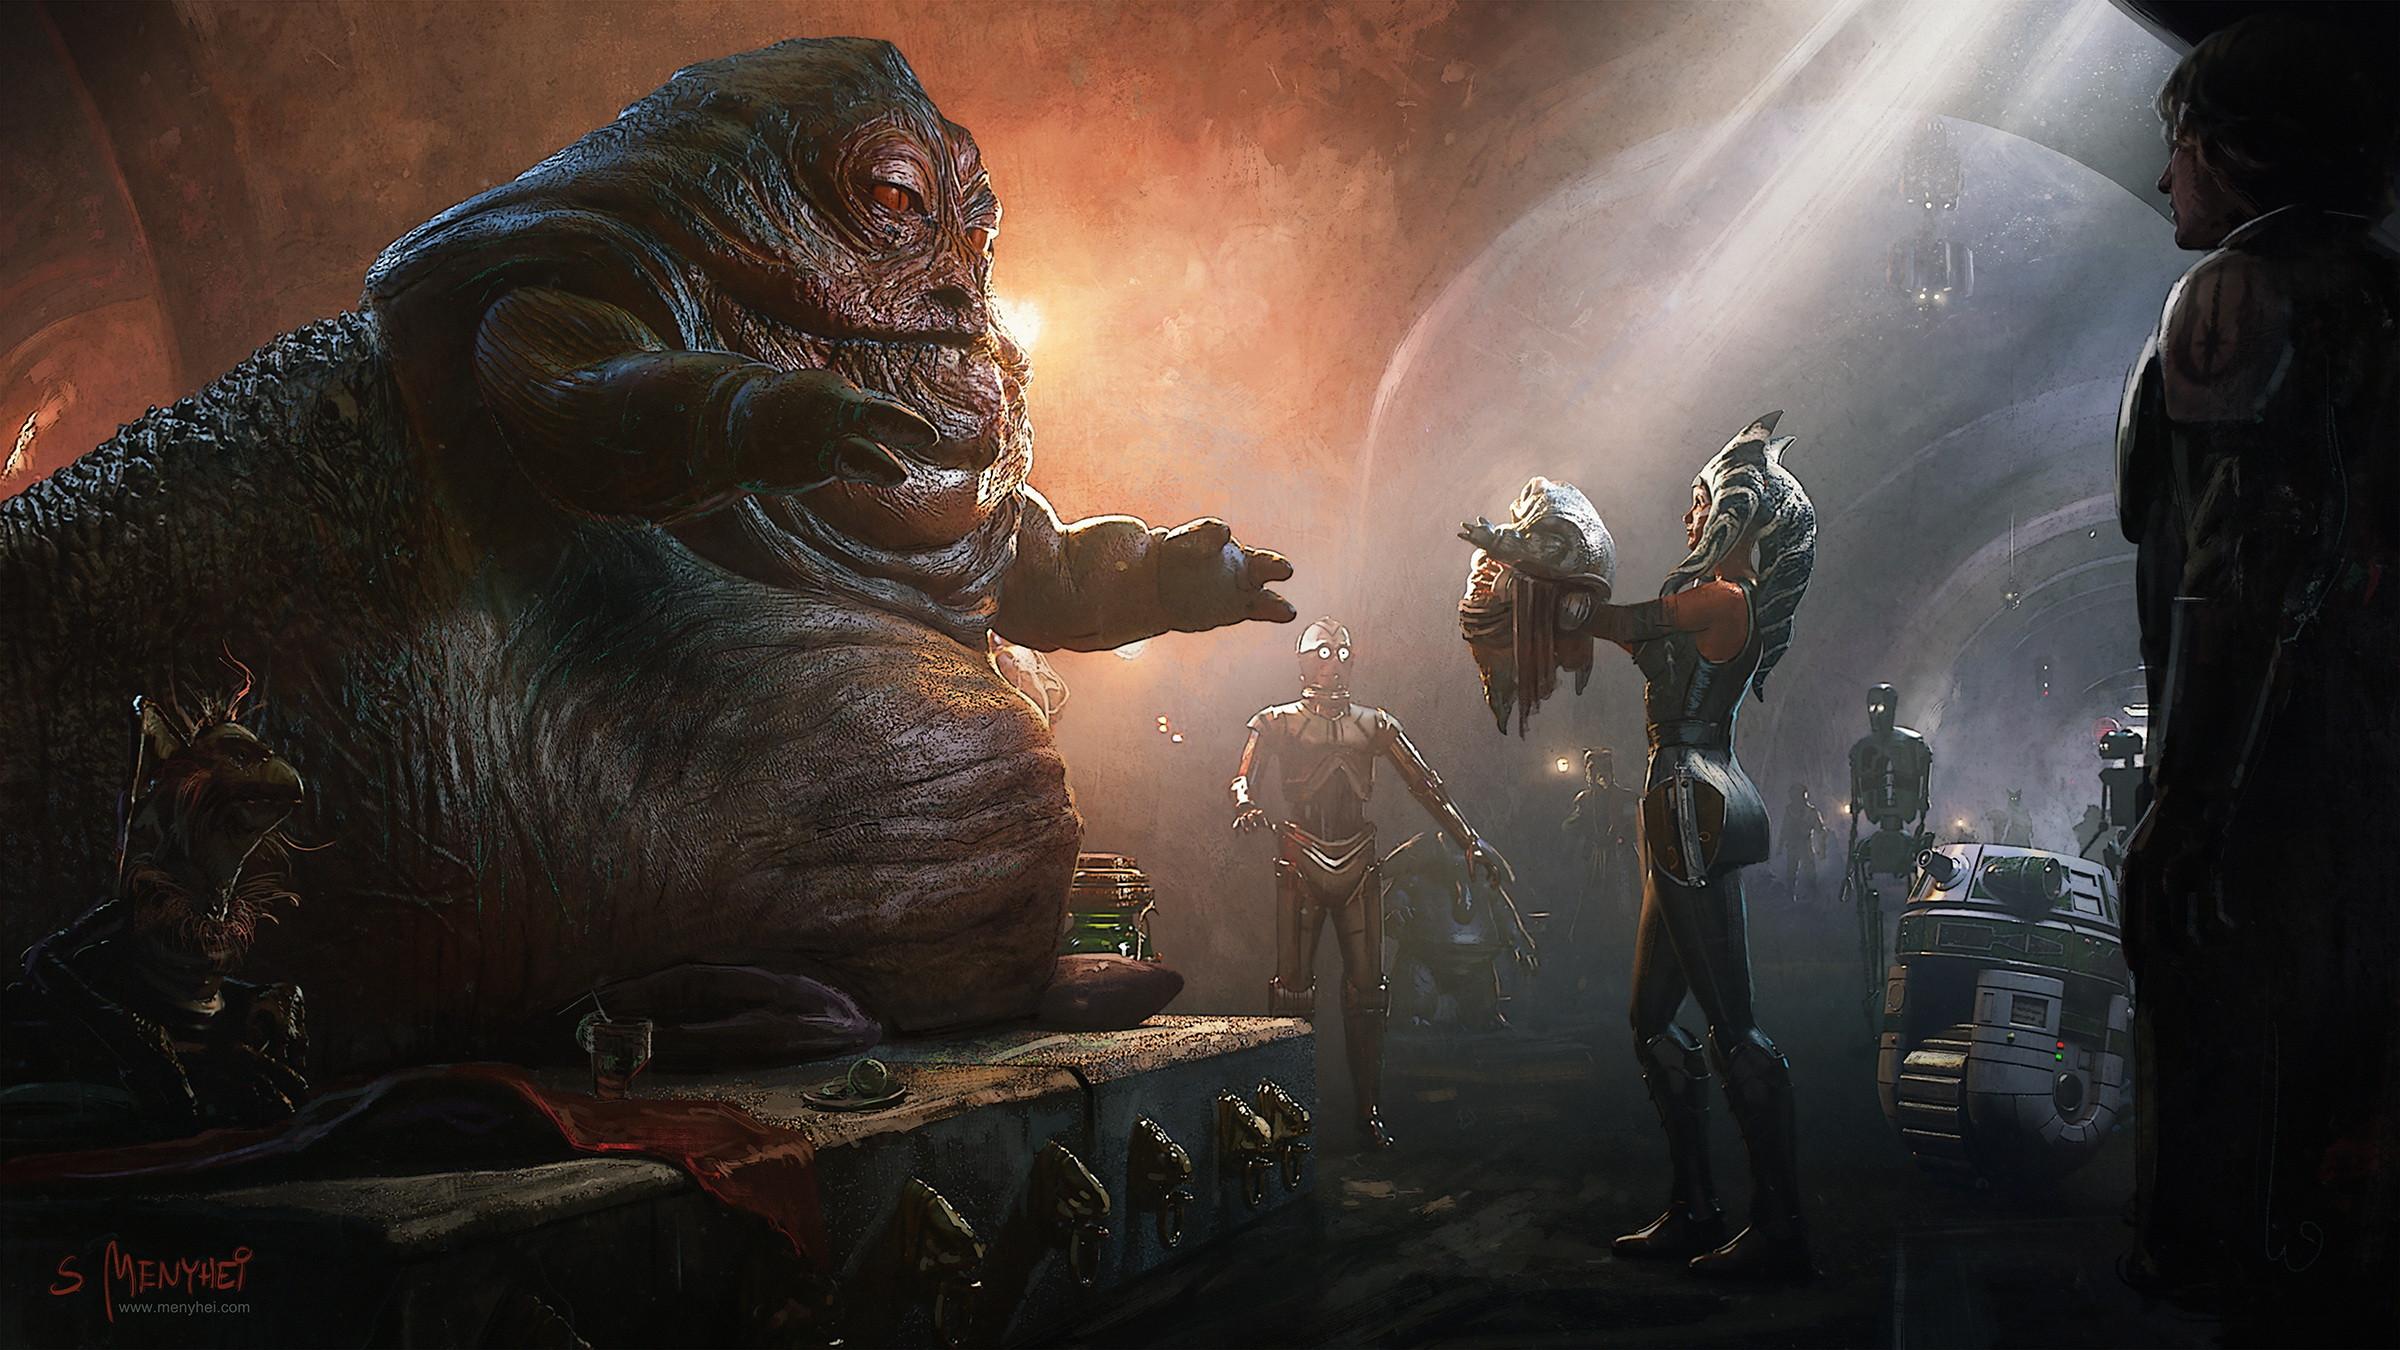 Ahsoka Tano returns Rotta the Huttlet to his father, Jabba